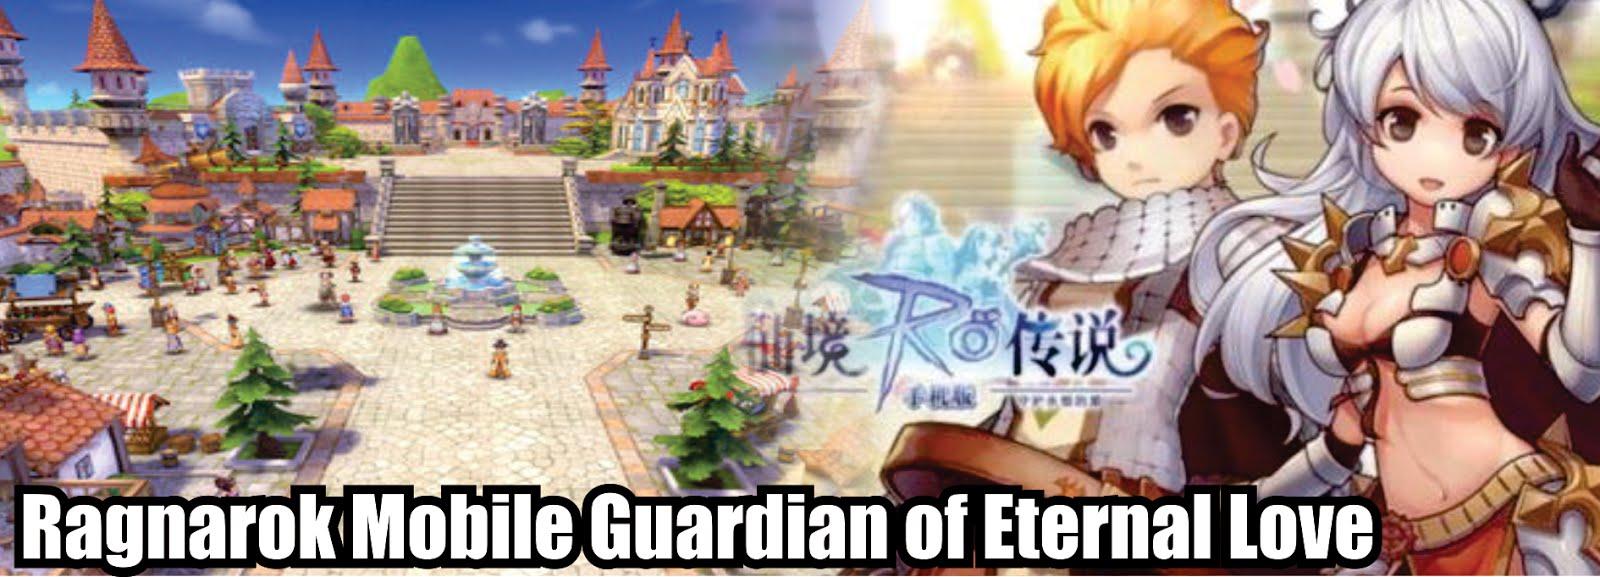 RAGNAROK MOBILE Guardian of Eternal Love